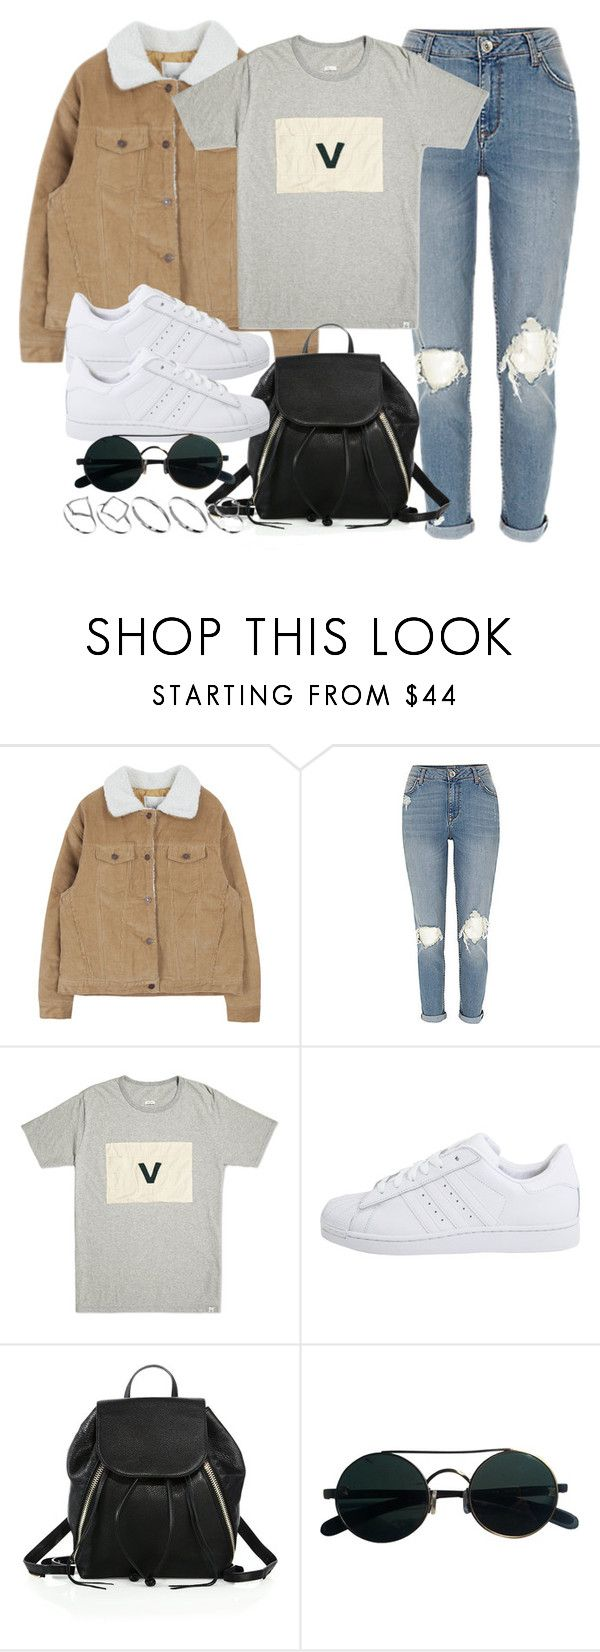 """Style #11662"" by vany-alvarado ❤ liked on Polyvore featuring Visvim, adidas Originals, Rebecca Minkoff and ASOS"